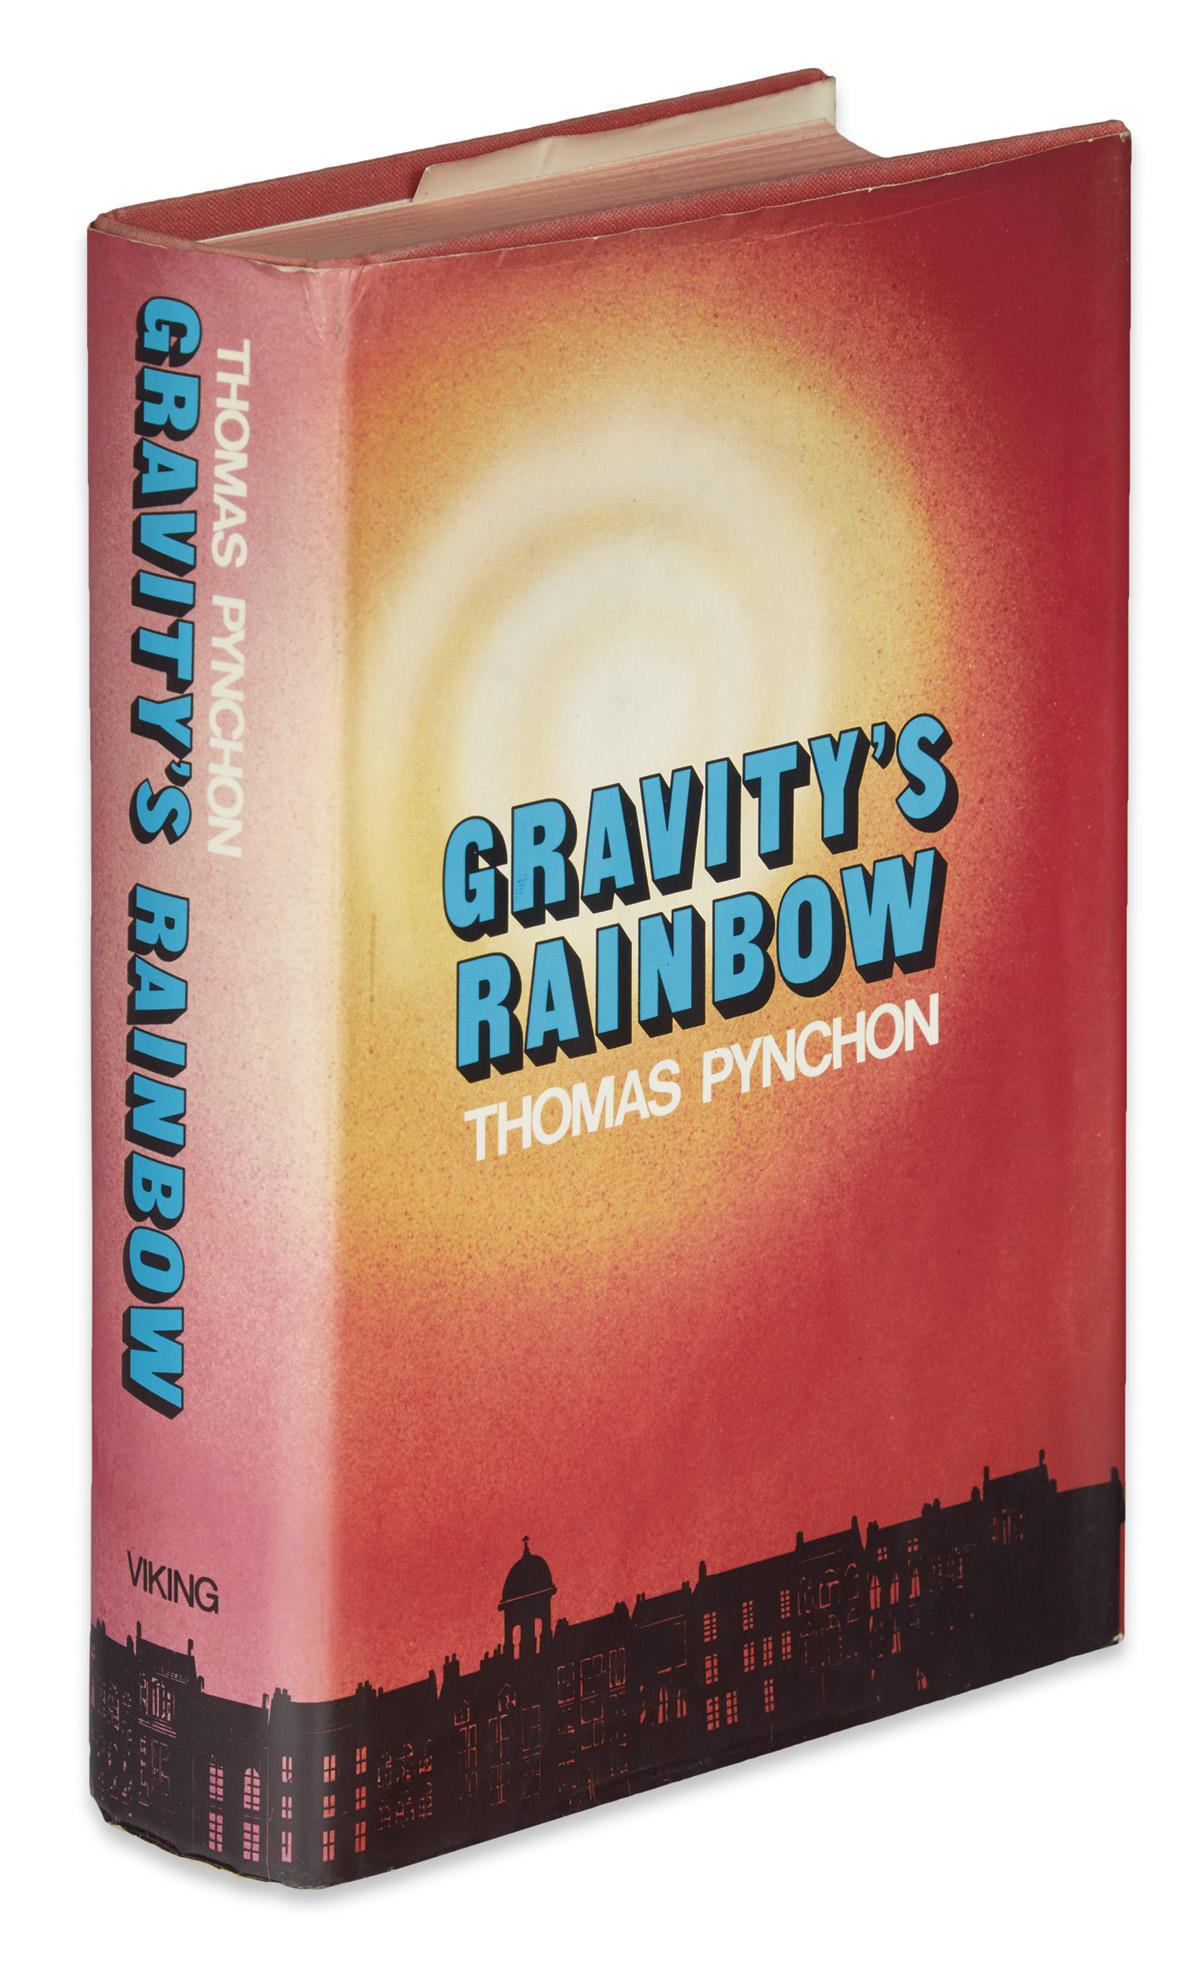 PYNCHON-THOMAS-Gravitys-Rainbow